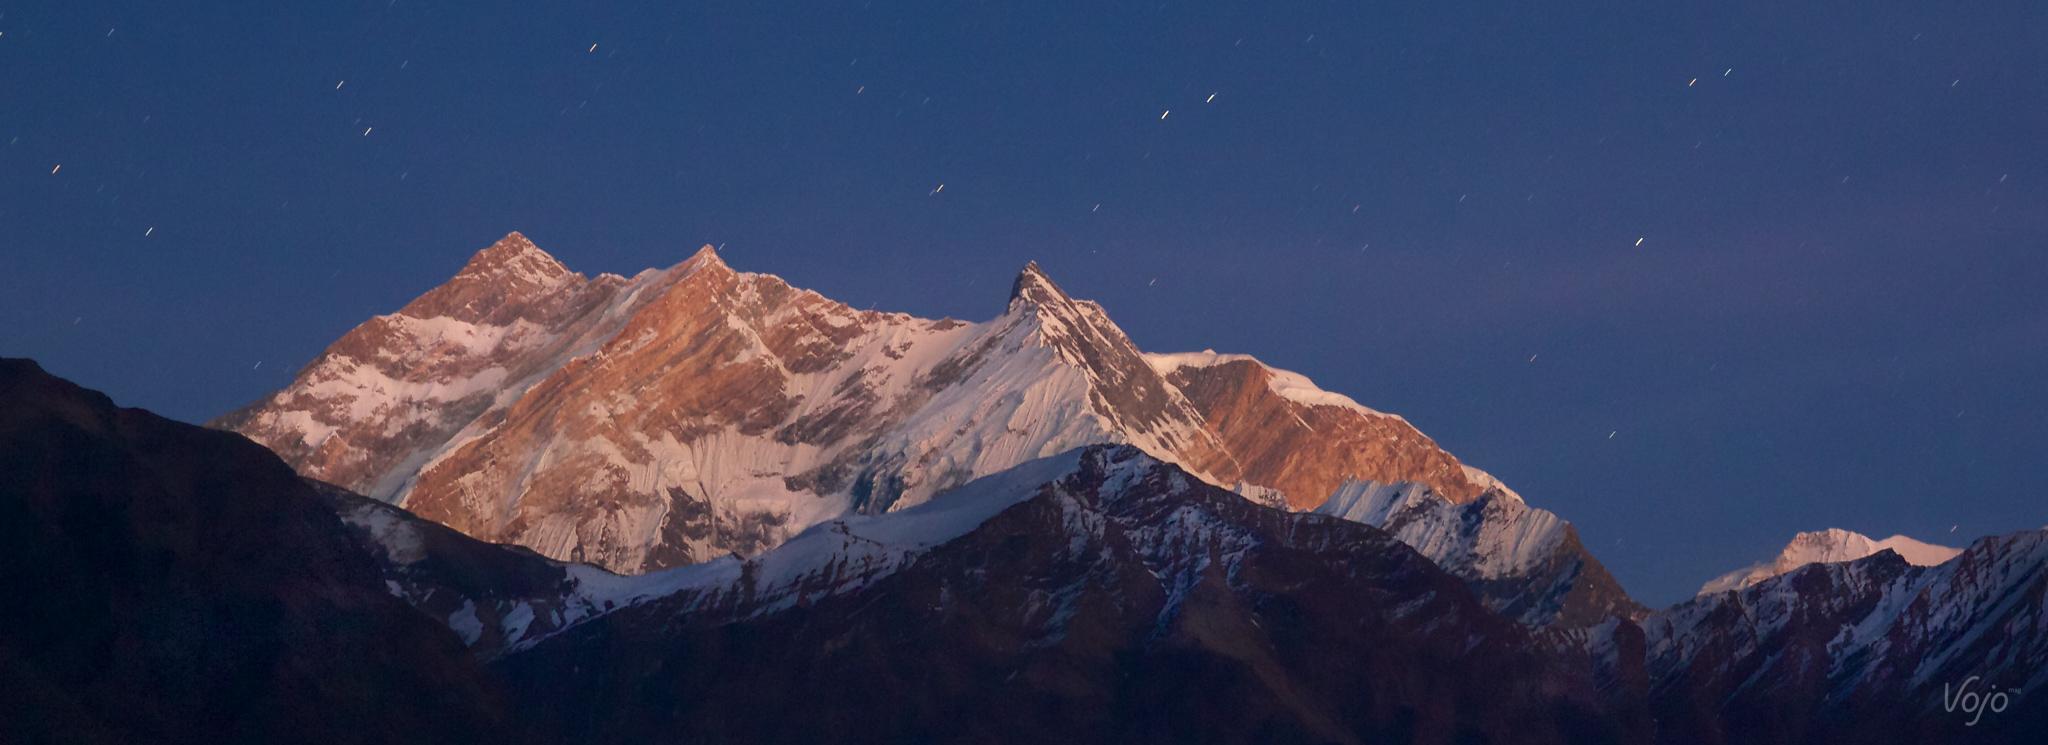 Nepal_Copyright_Molinero_VojoMag-1